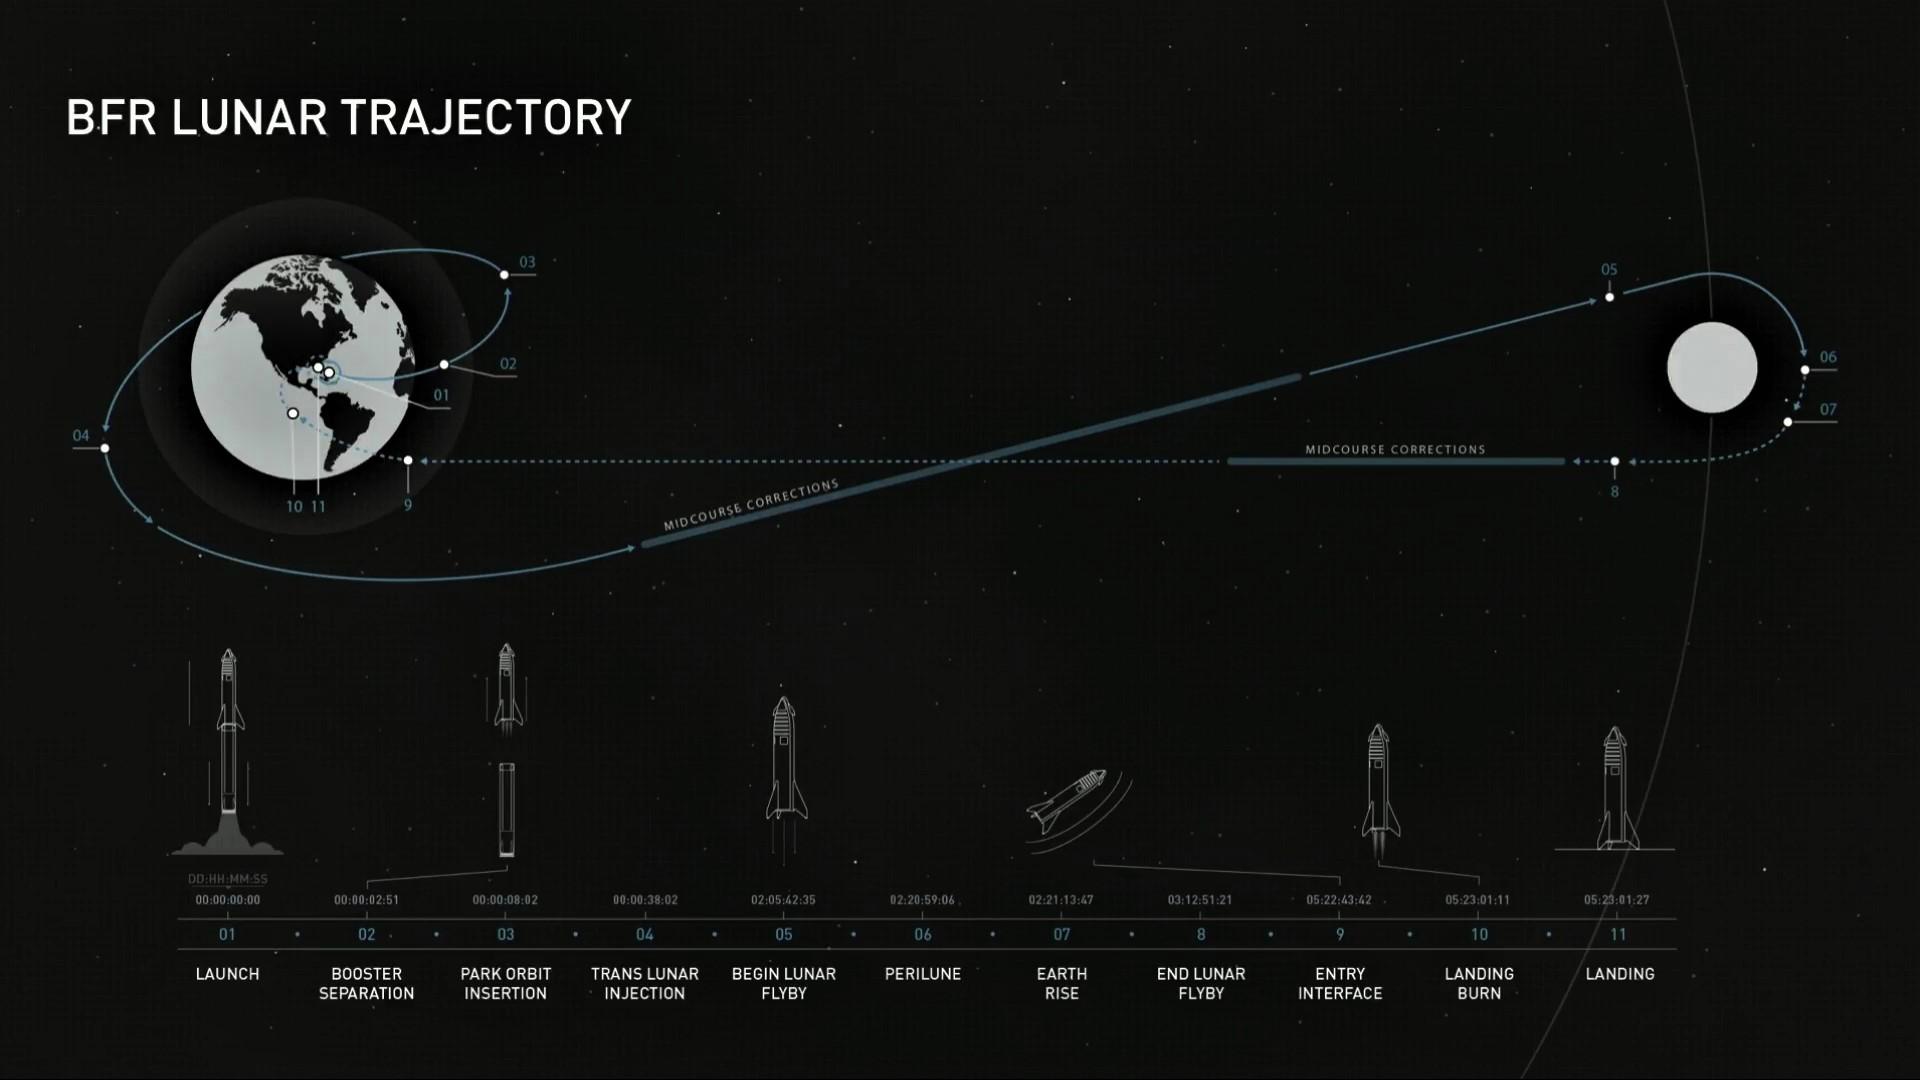 BFR circumlunar trajectory (SpaceX)